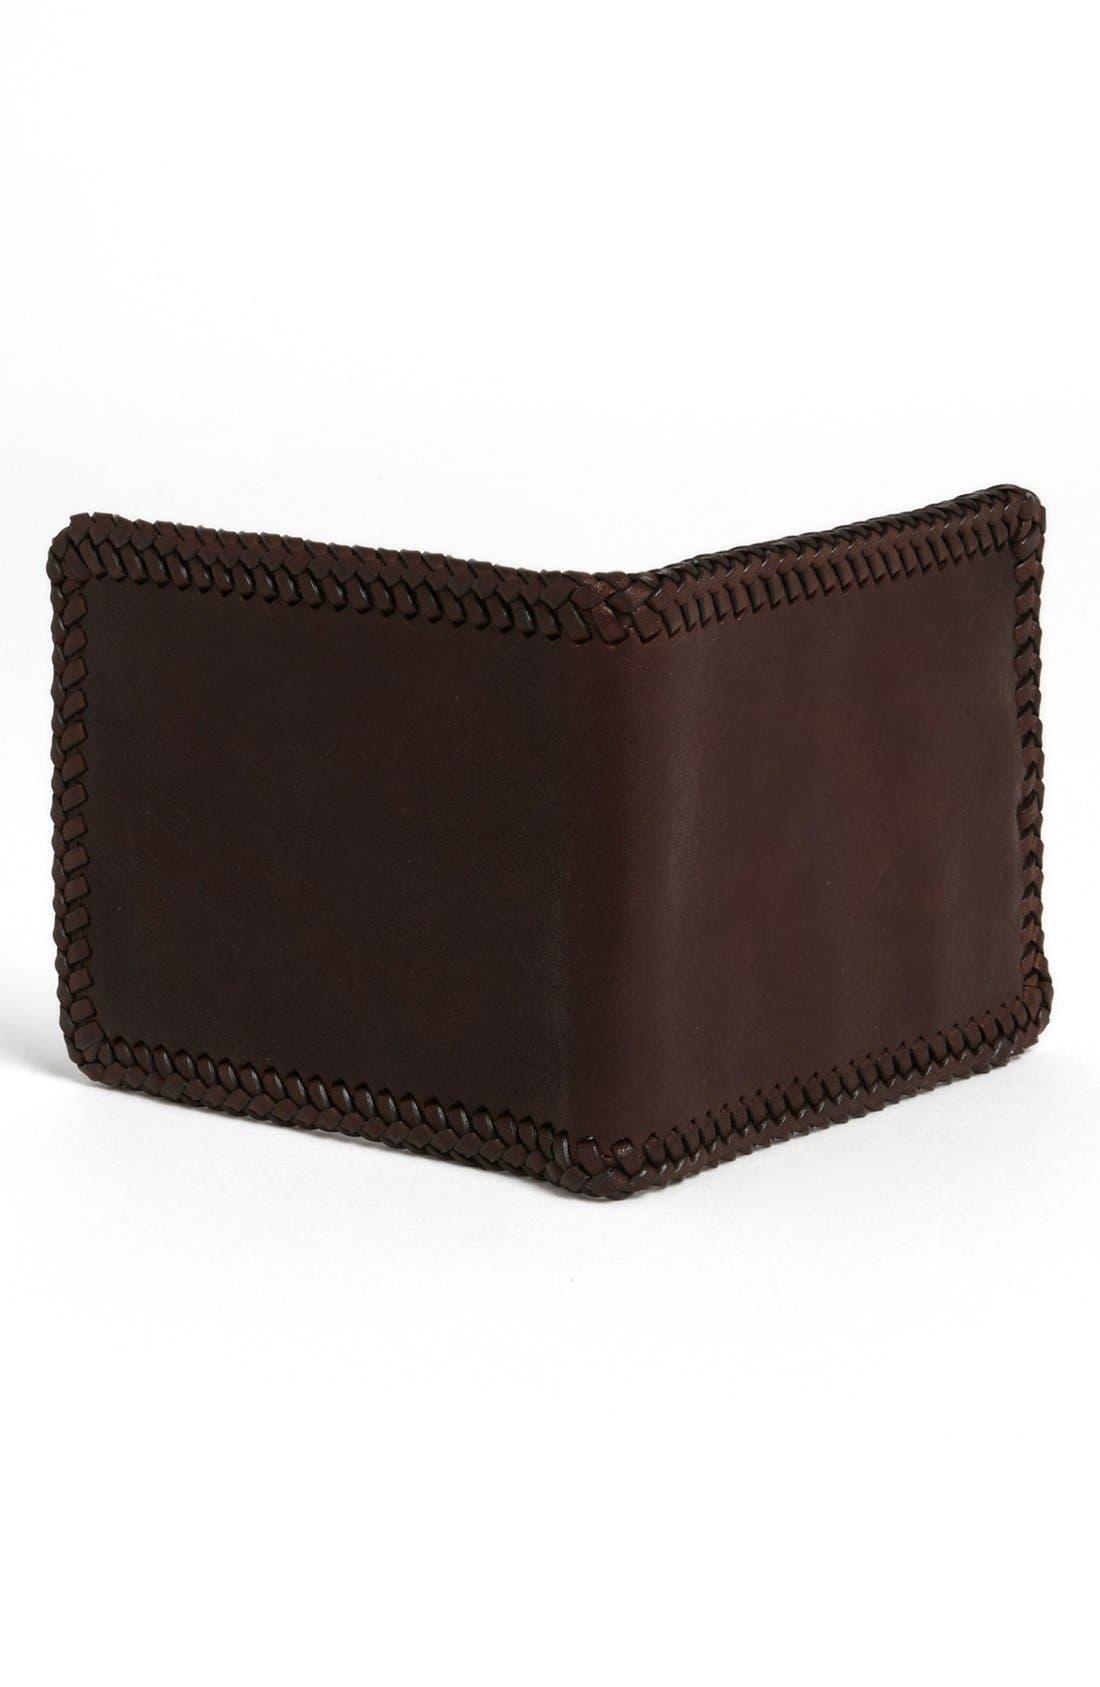 Alternate Image 2  - John Varvatos Collection Braided Leather Wallet